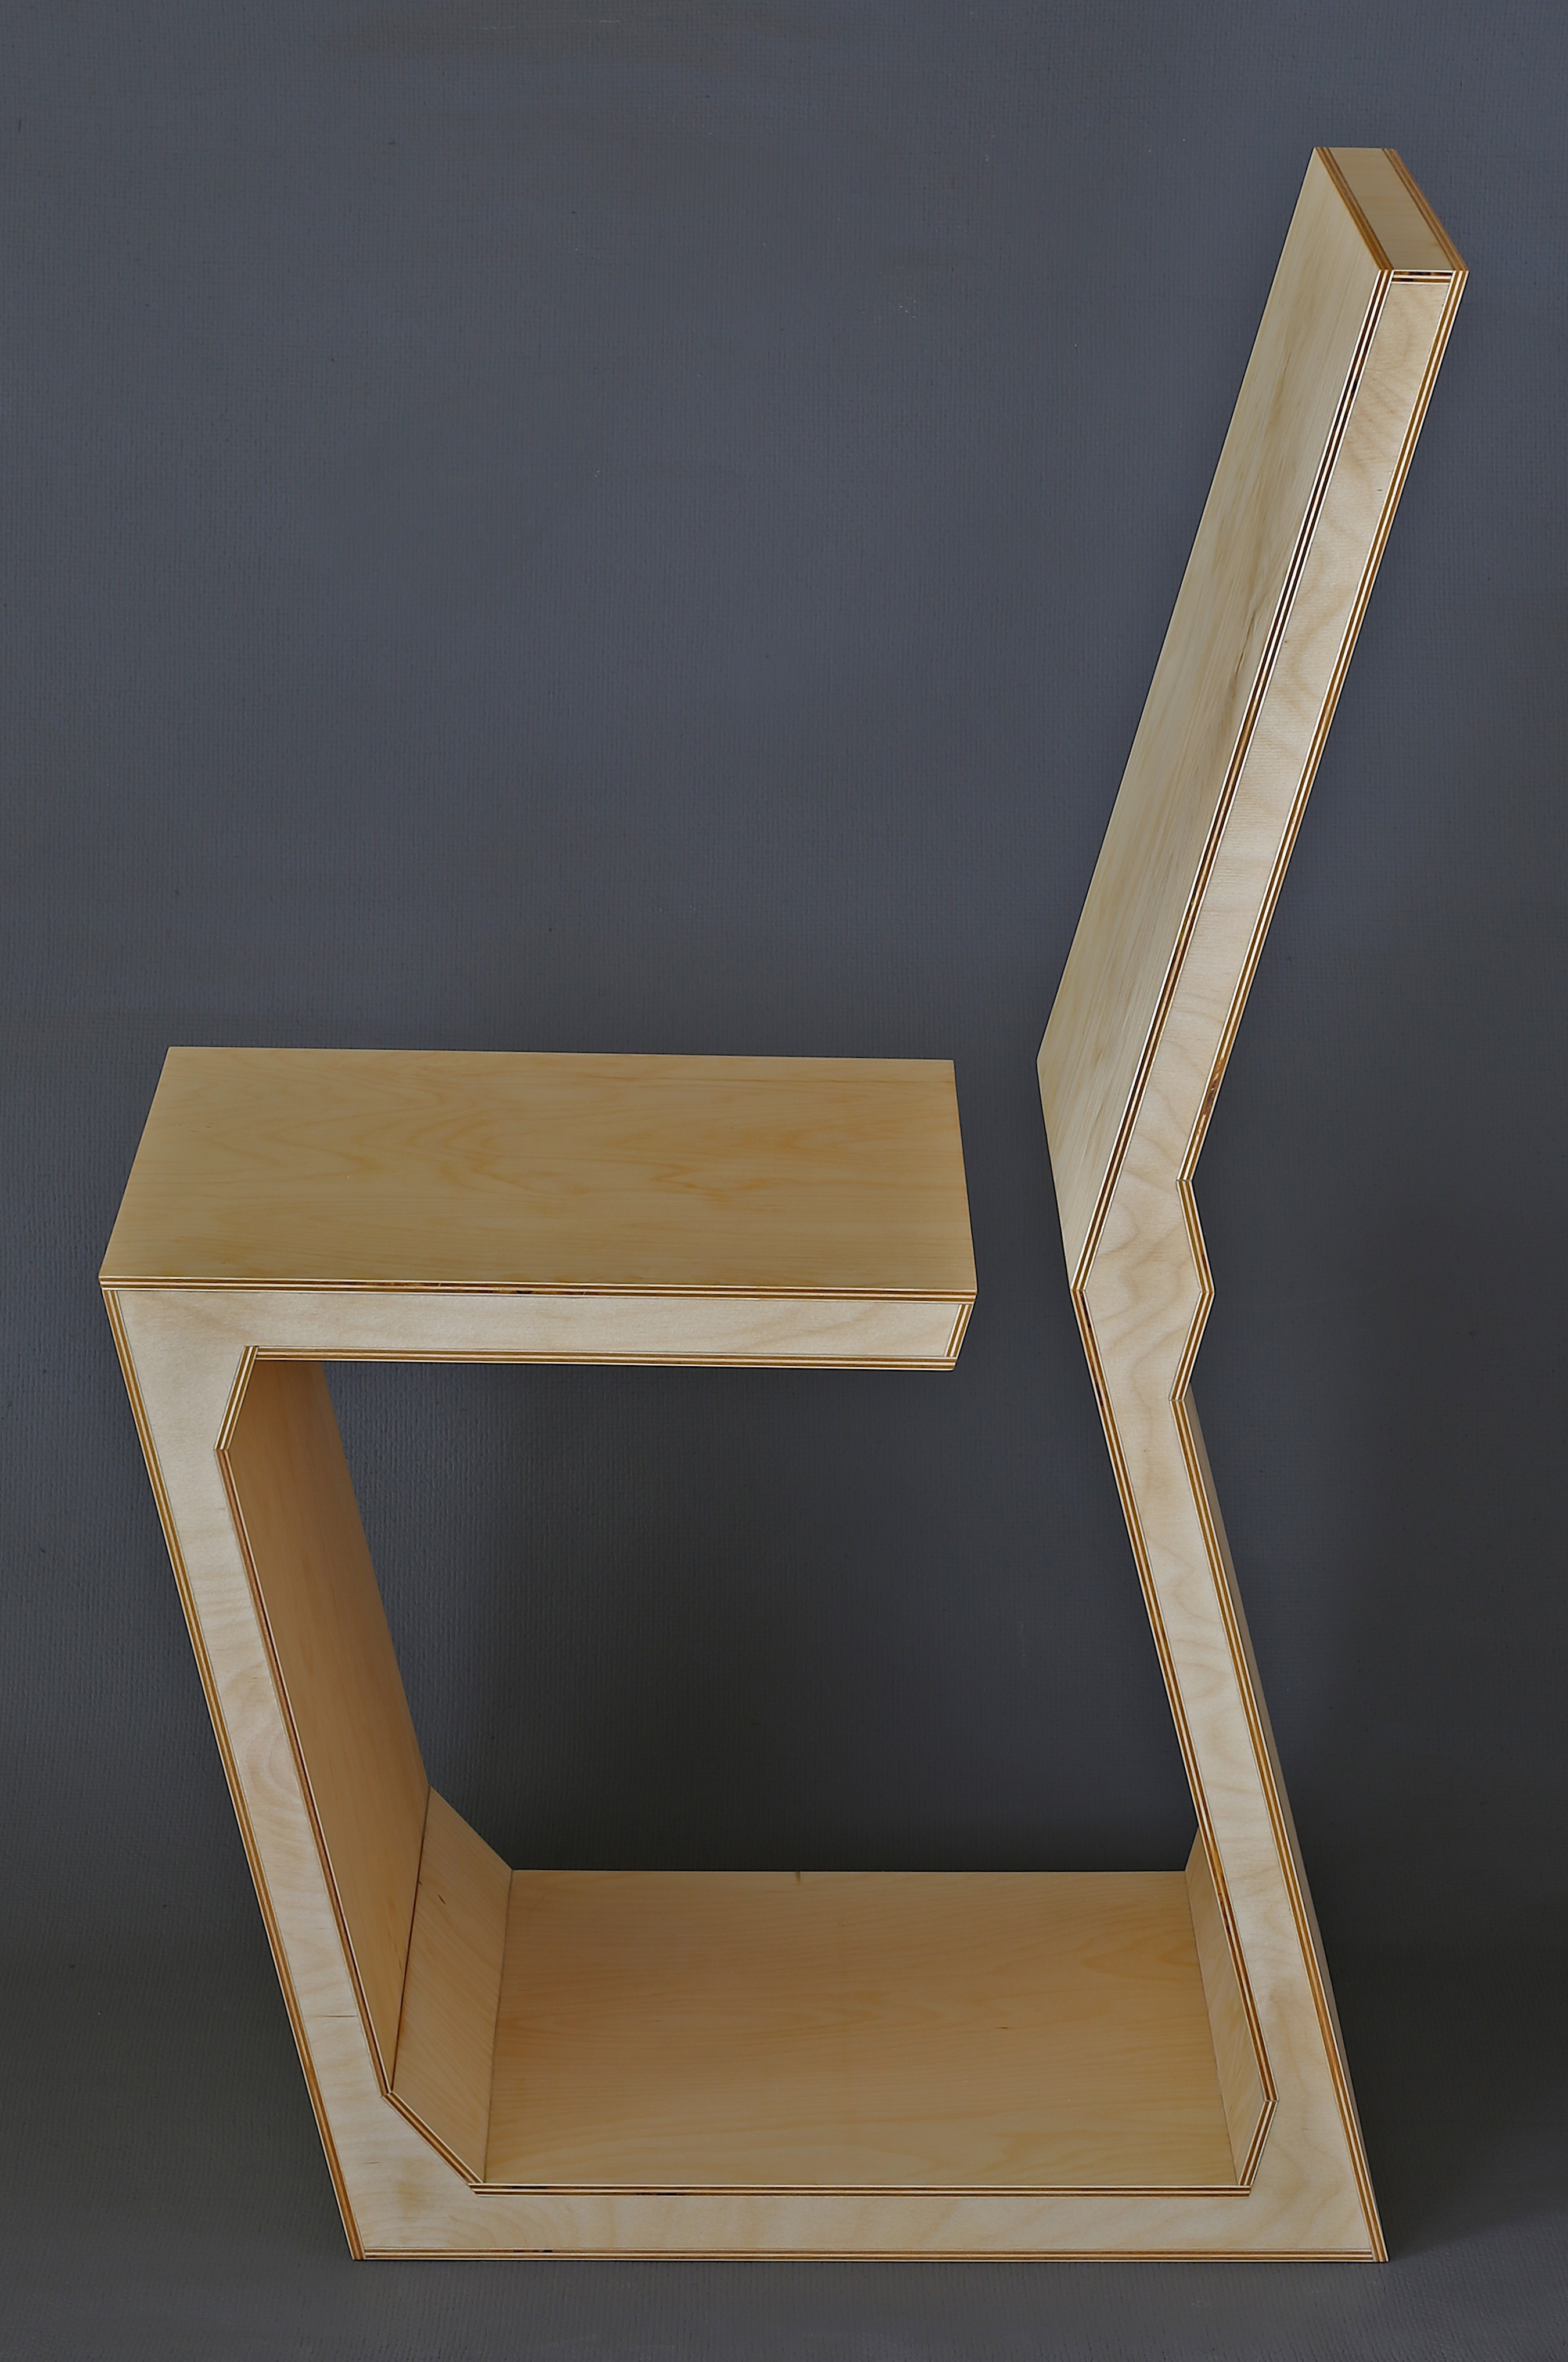 Dirk Marwig U201cGAP CHAIRu201d 2015 (High Density Plywood, Wood Glue And Wood Oil,  92.5cm X 42.8cm X 59cm, Dirk Marwig 2015)